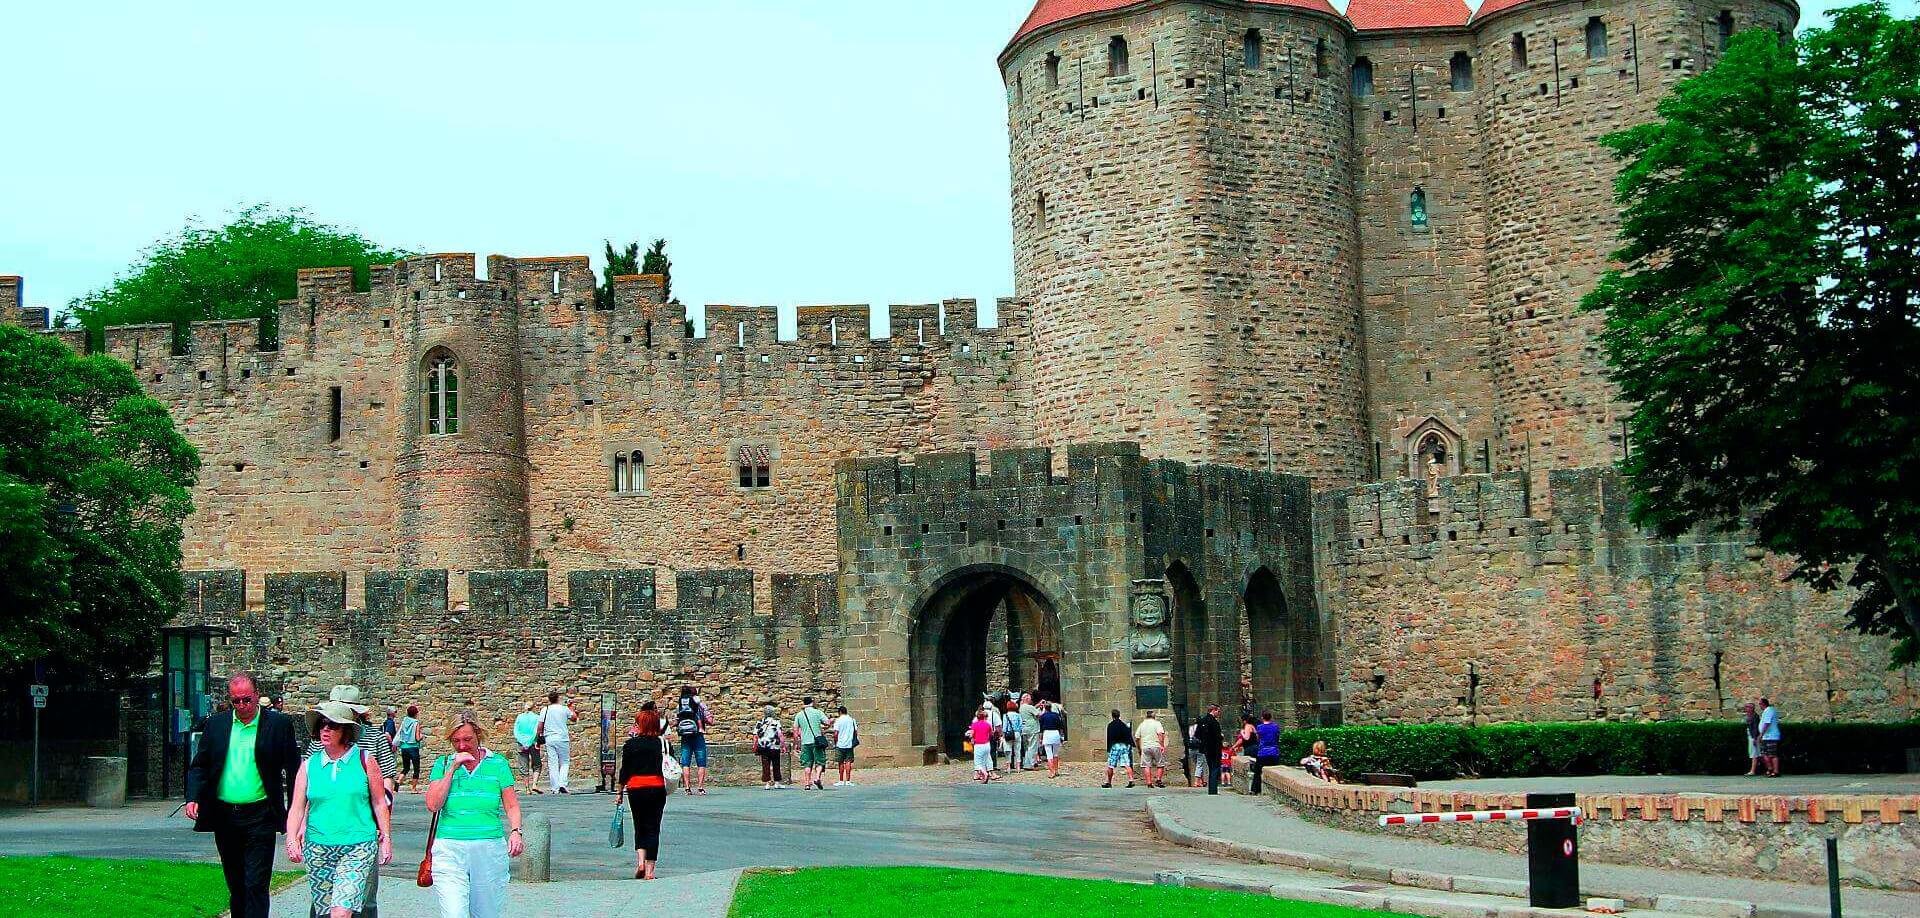 Sant Feliu de Guixols - Carcassonne (França)